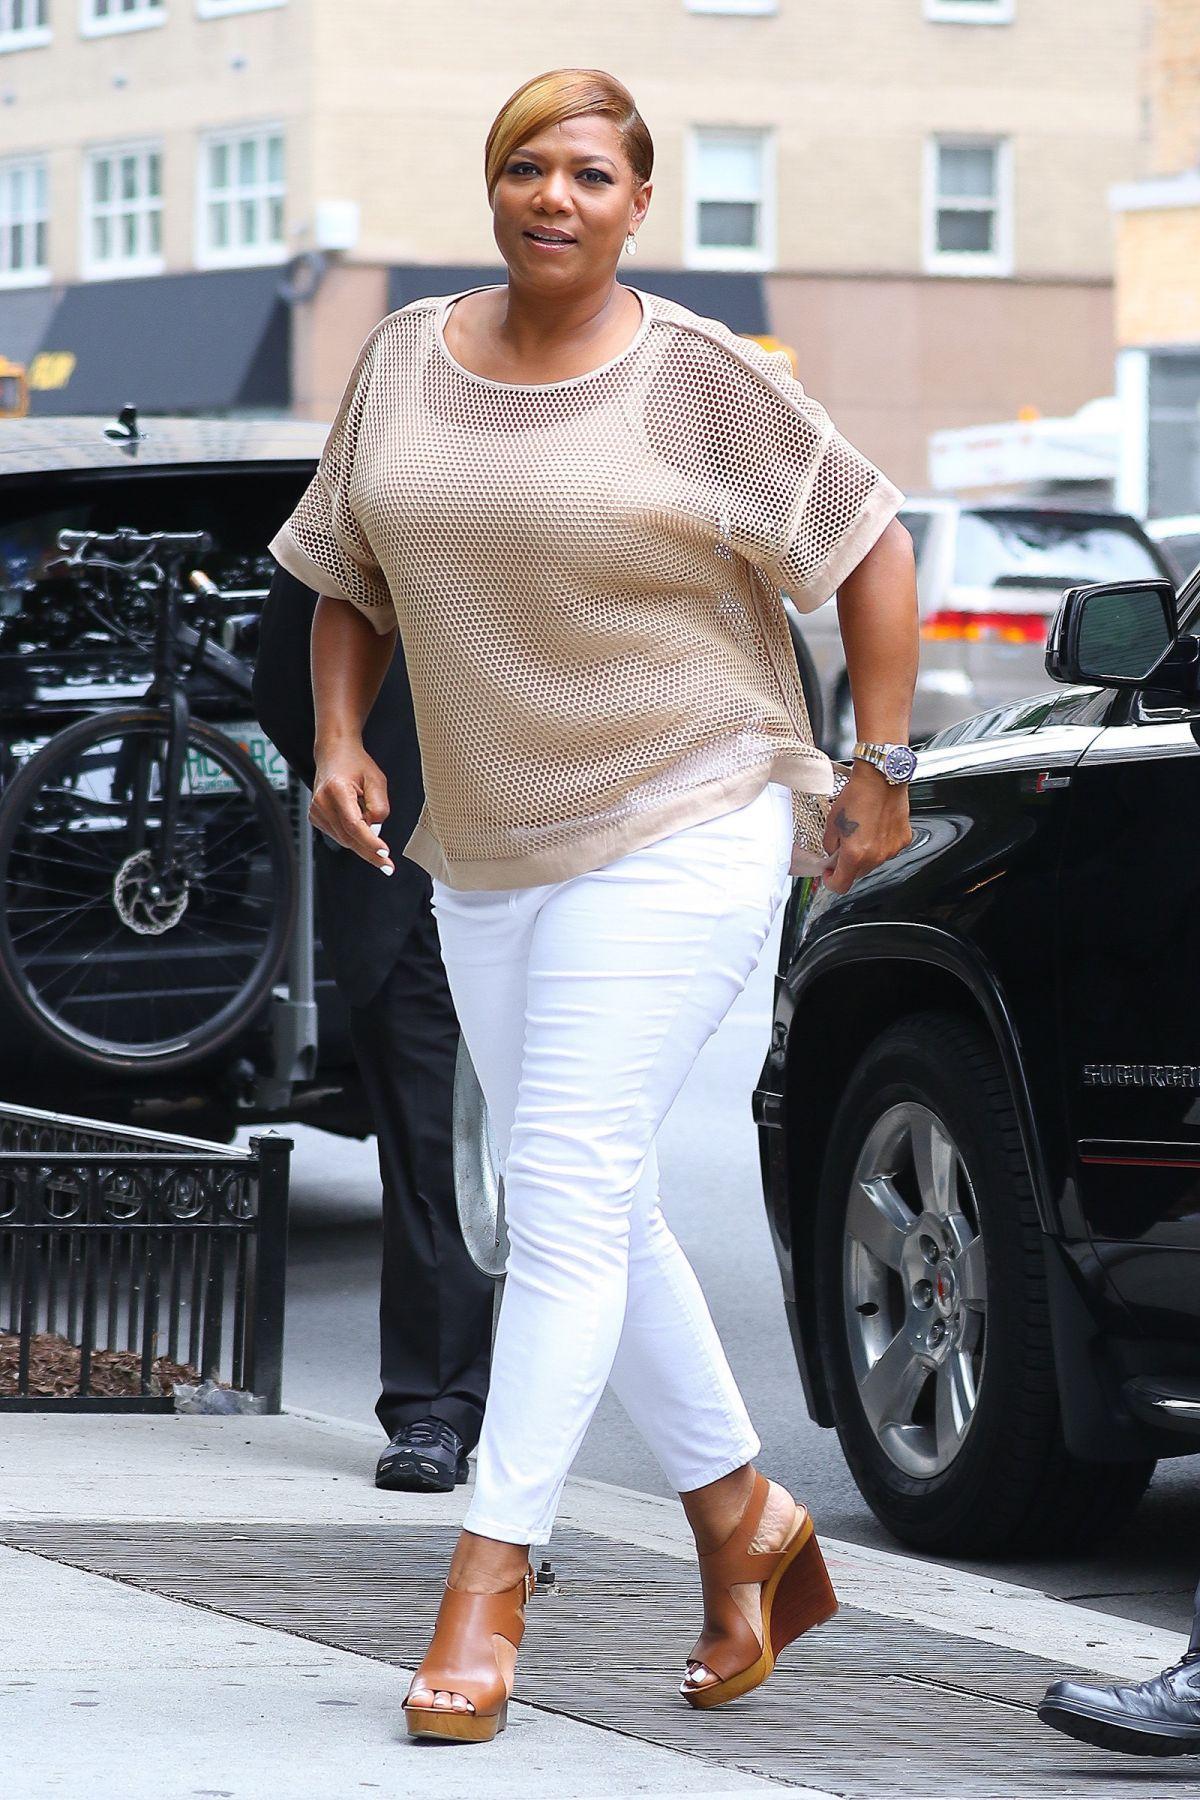 who is queen latifah dating About queen latifah including queen latifah photos, news, gossip and videos.